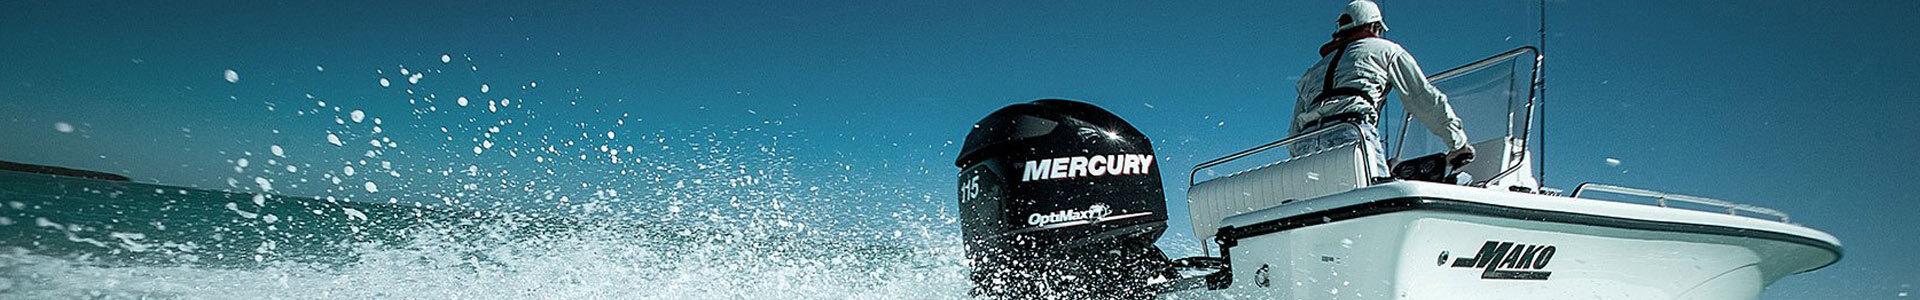 Mercury Outboards Dealer - Northern Leisure Marine